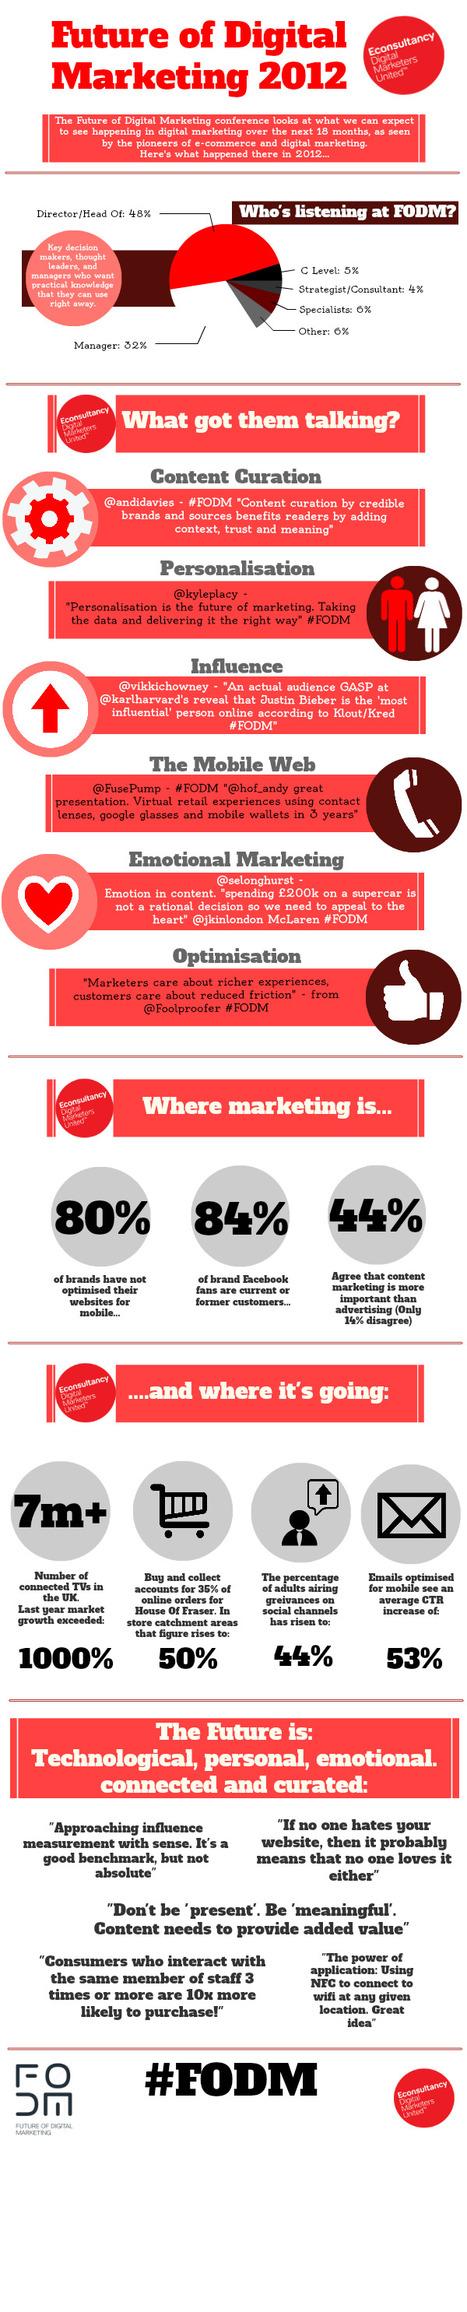 The Future Of Digital Marketing [Infographic] | Digital marketing & social media | Scoop.it